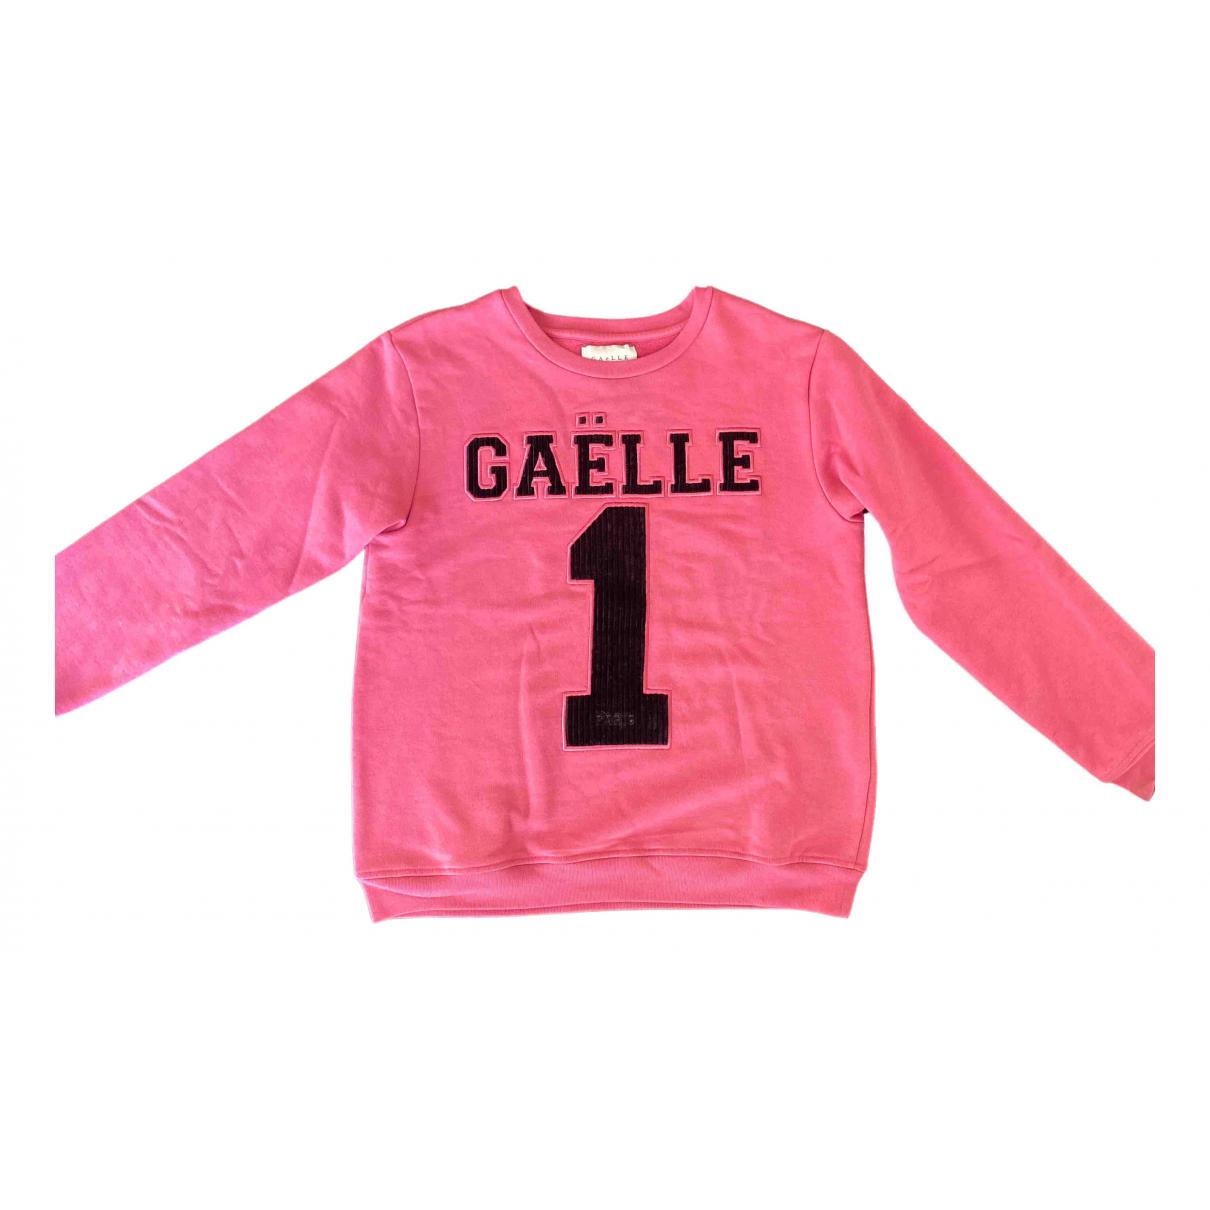 Gaelle Paris N Cotton Knitwear for Kids 18 years - L UK